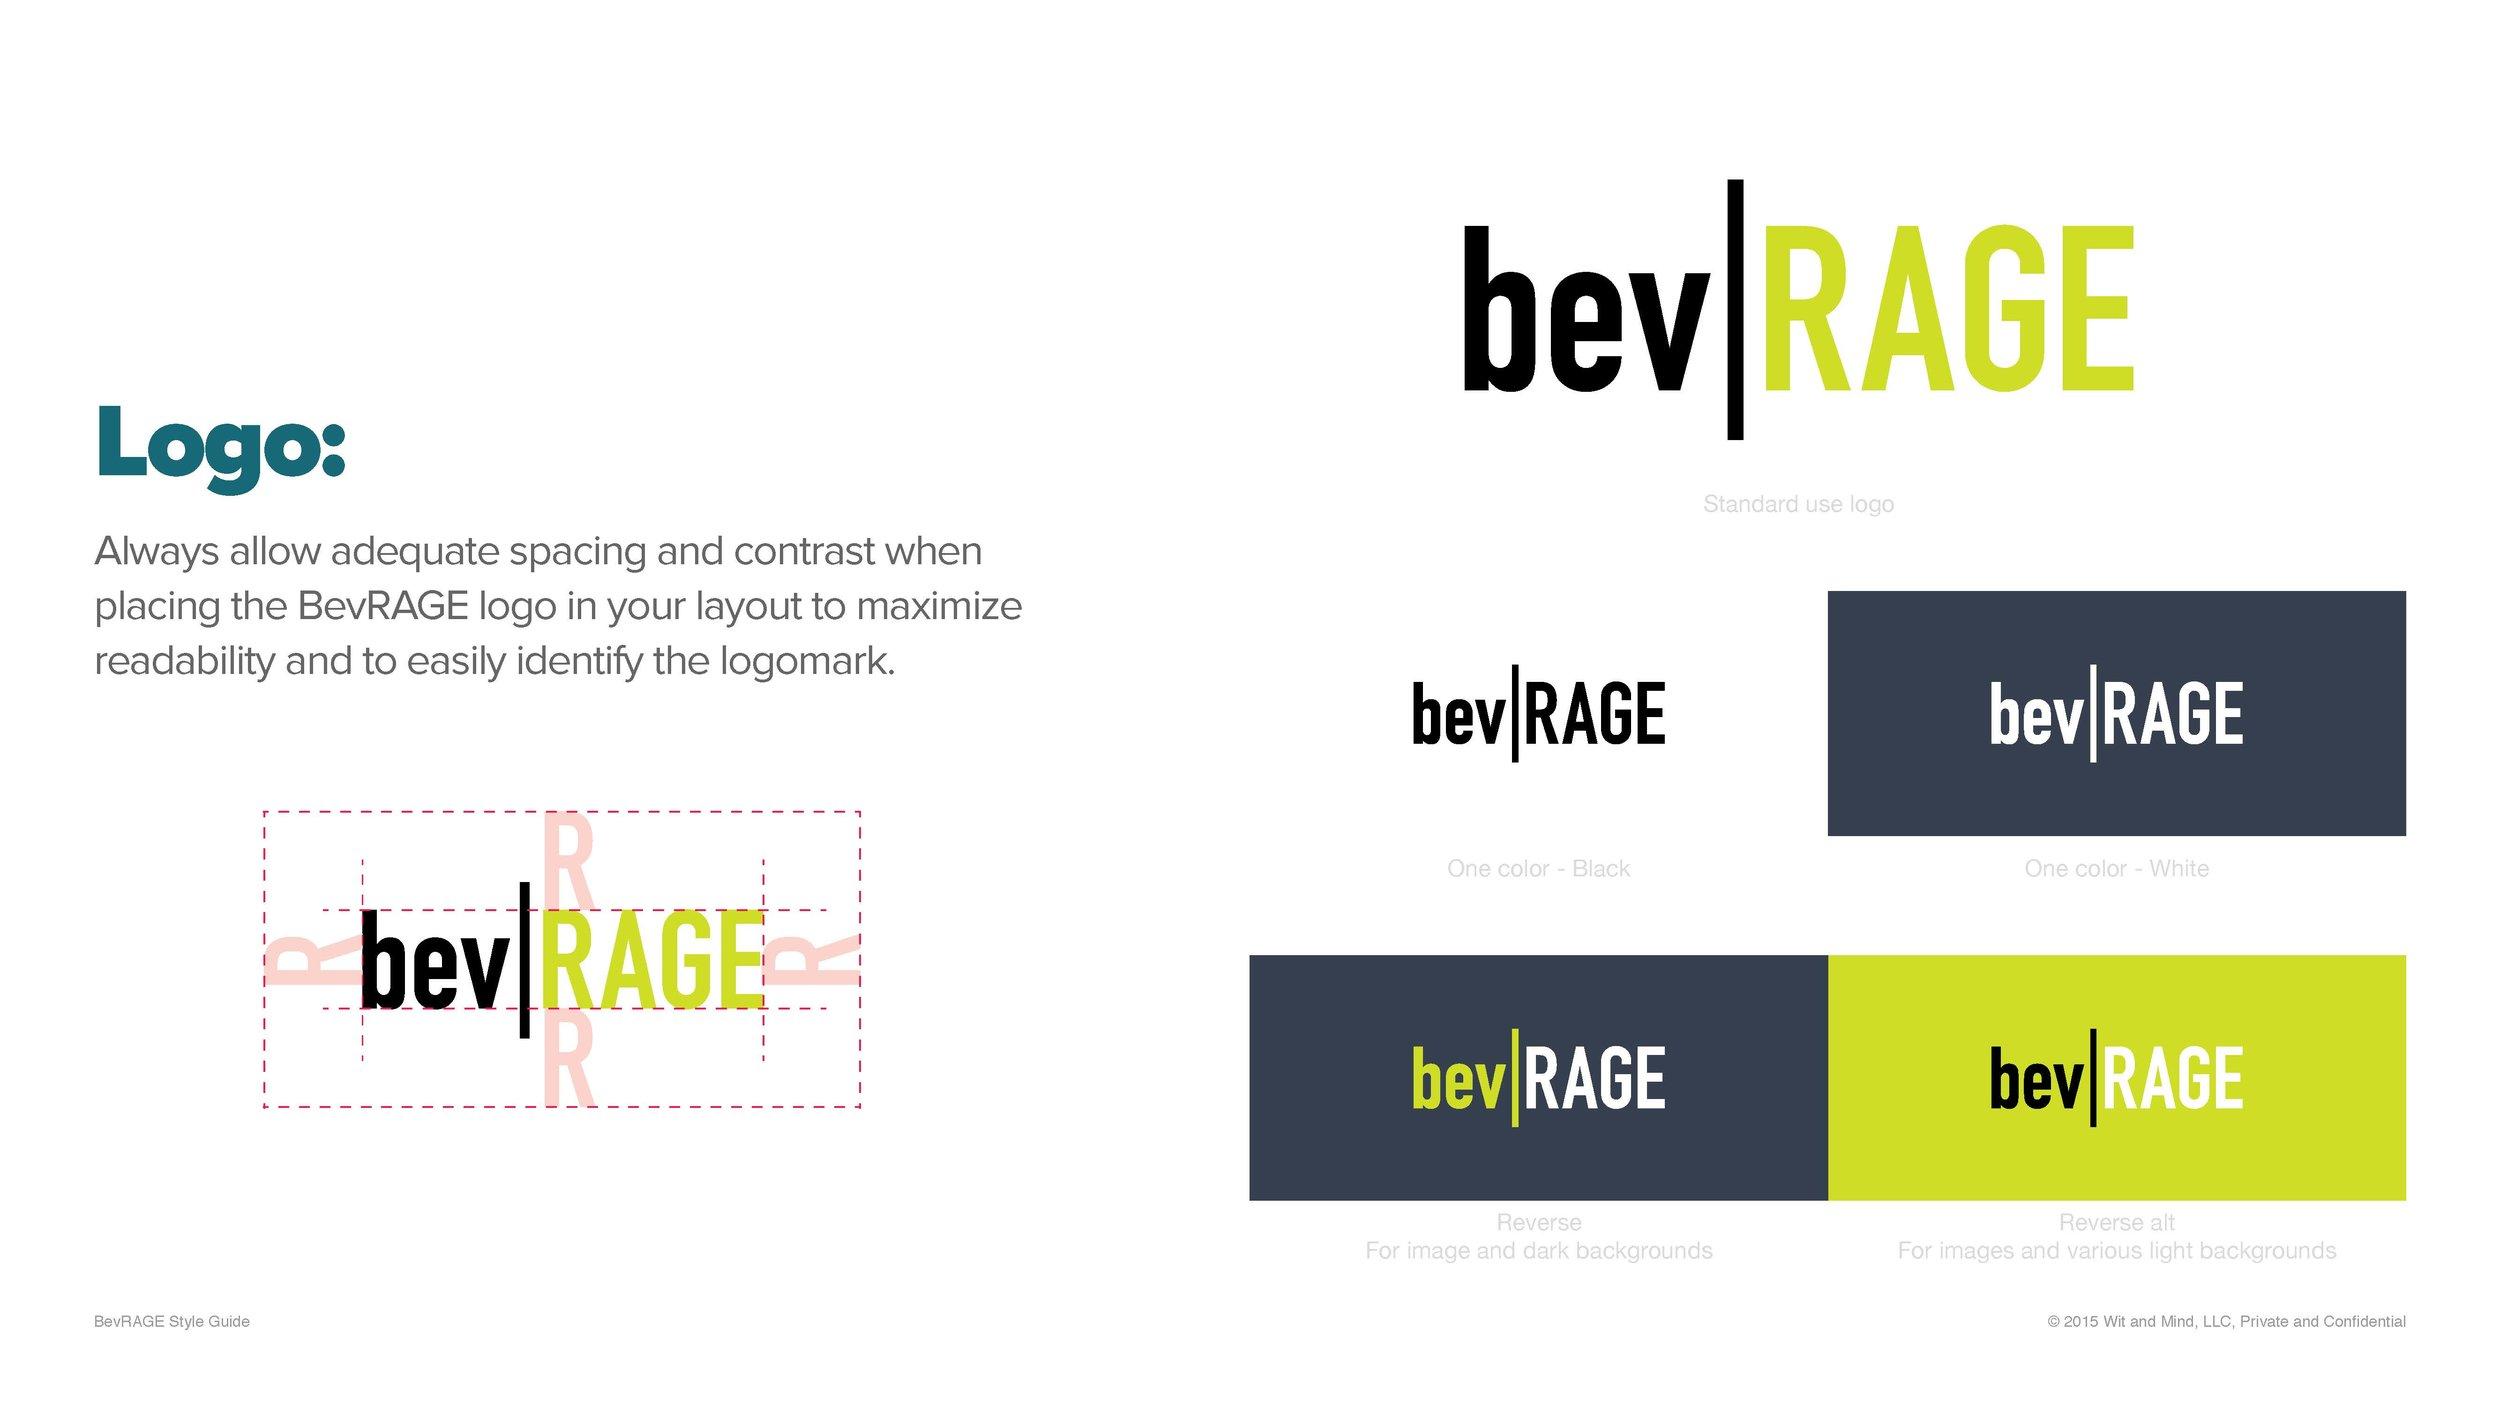 BevRAGE_Styleguide_121015_Page_03.jpg